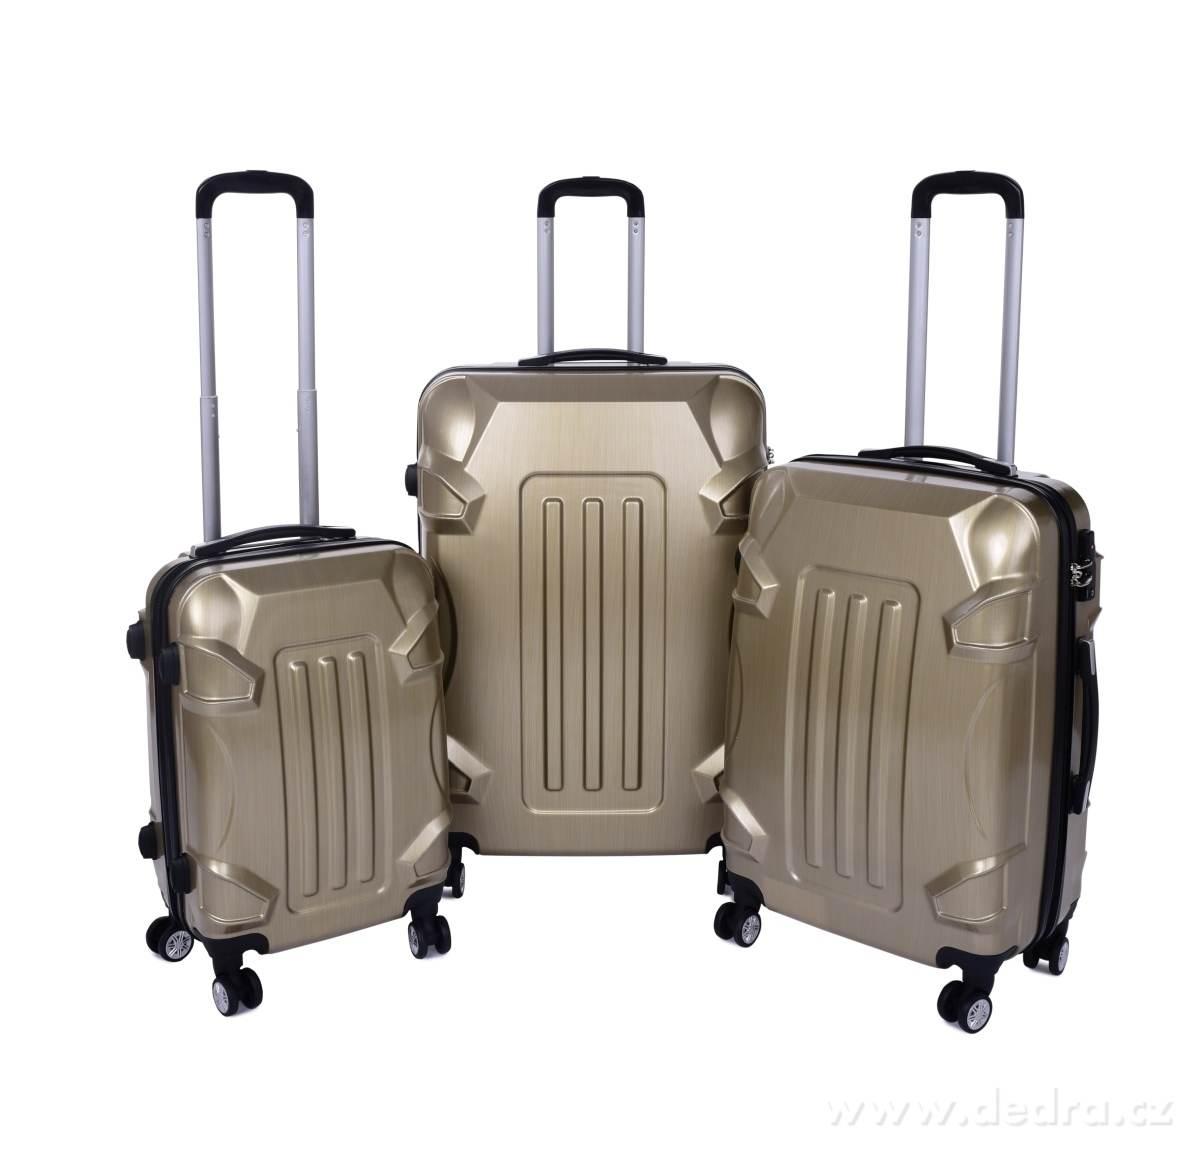 10dcc35477baa TSA kufor stredný GOLD RELIEF   DEDRA eshop